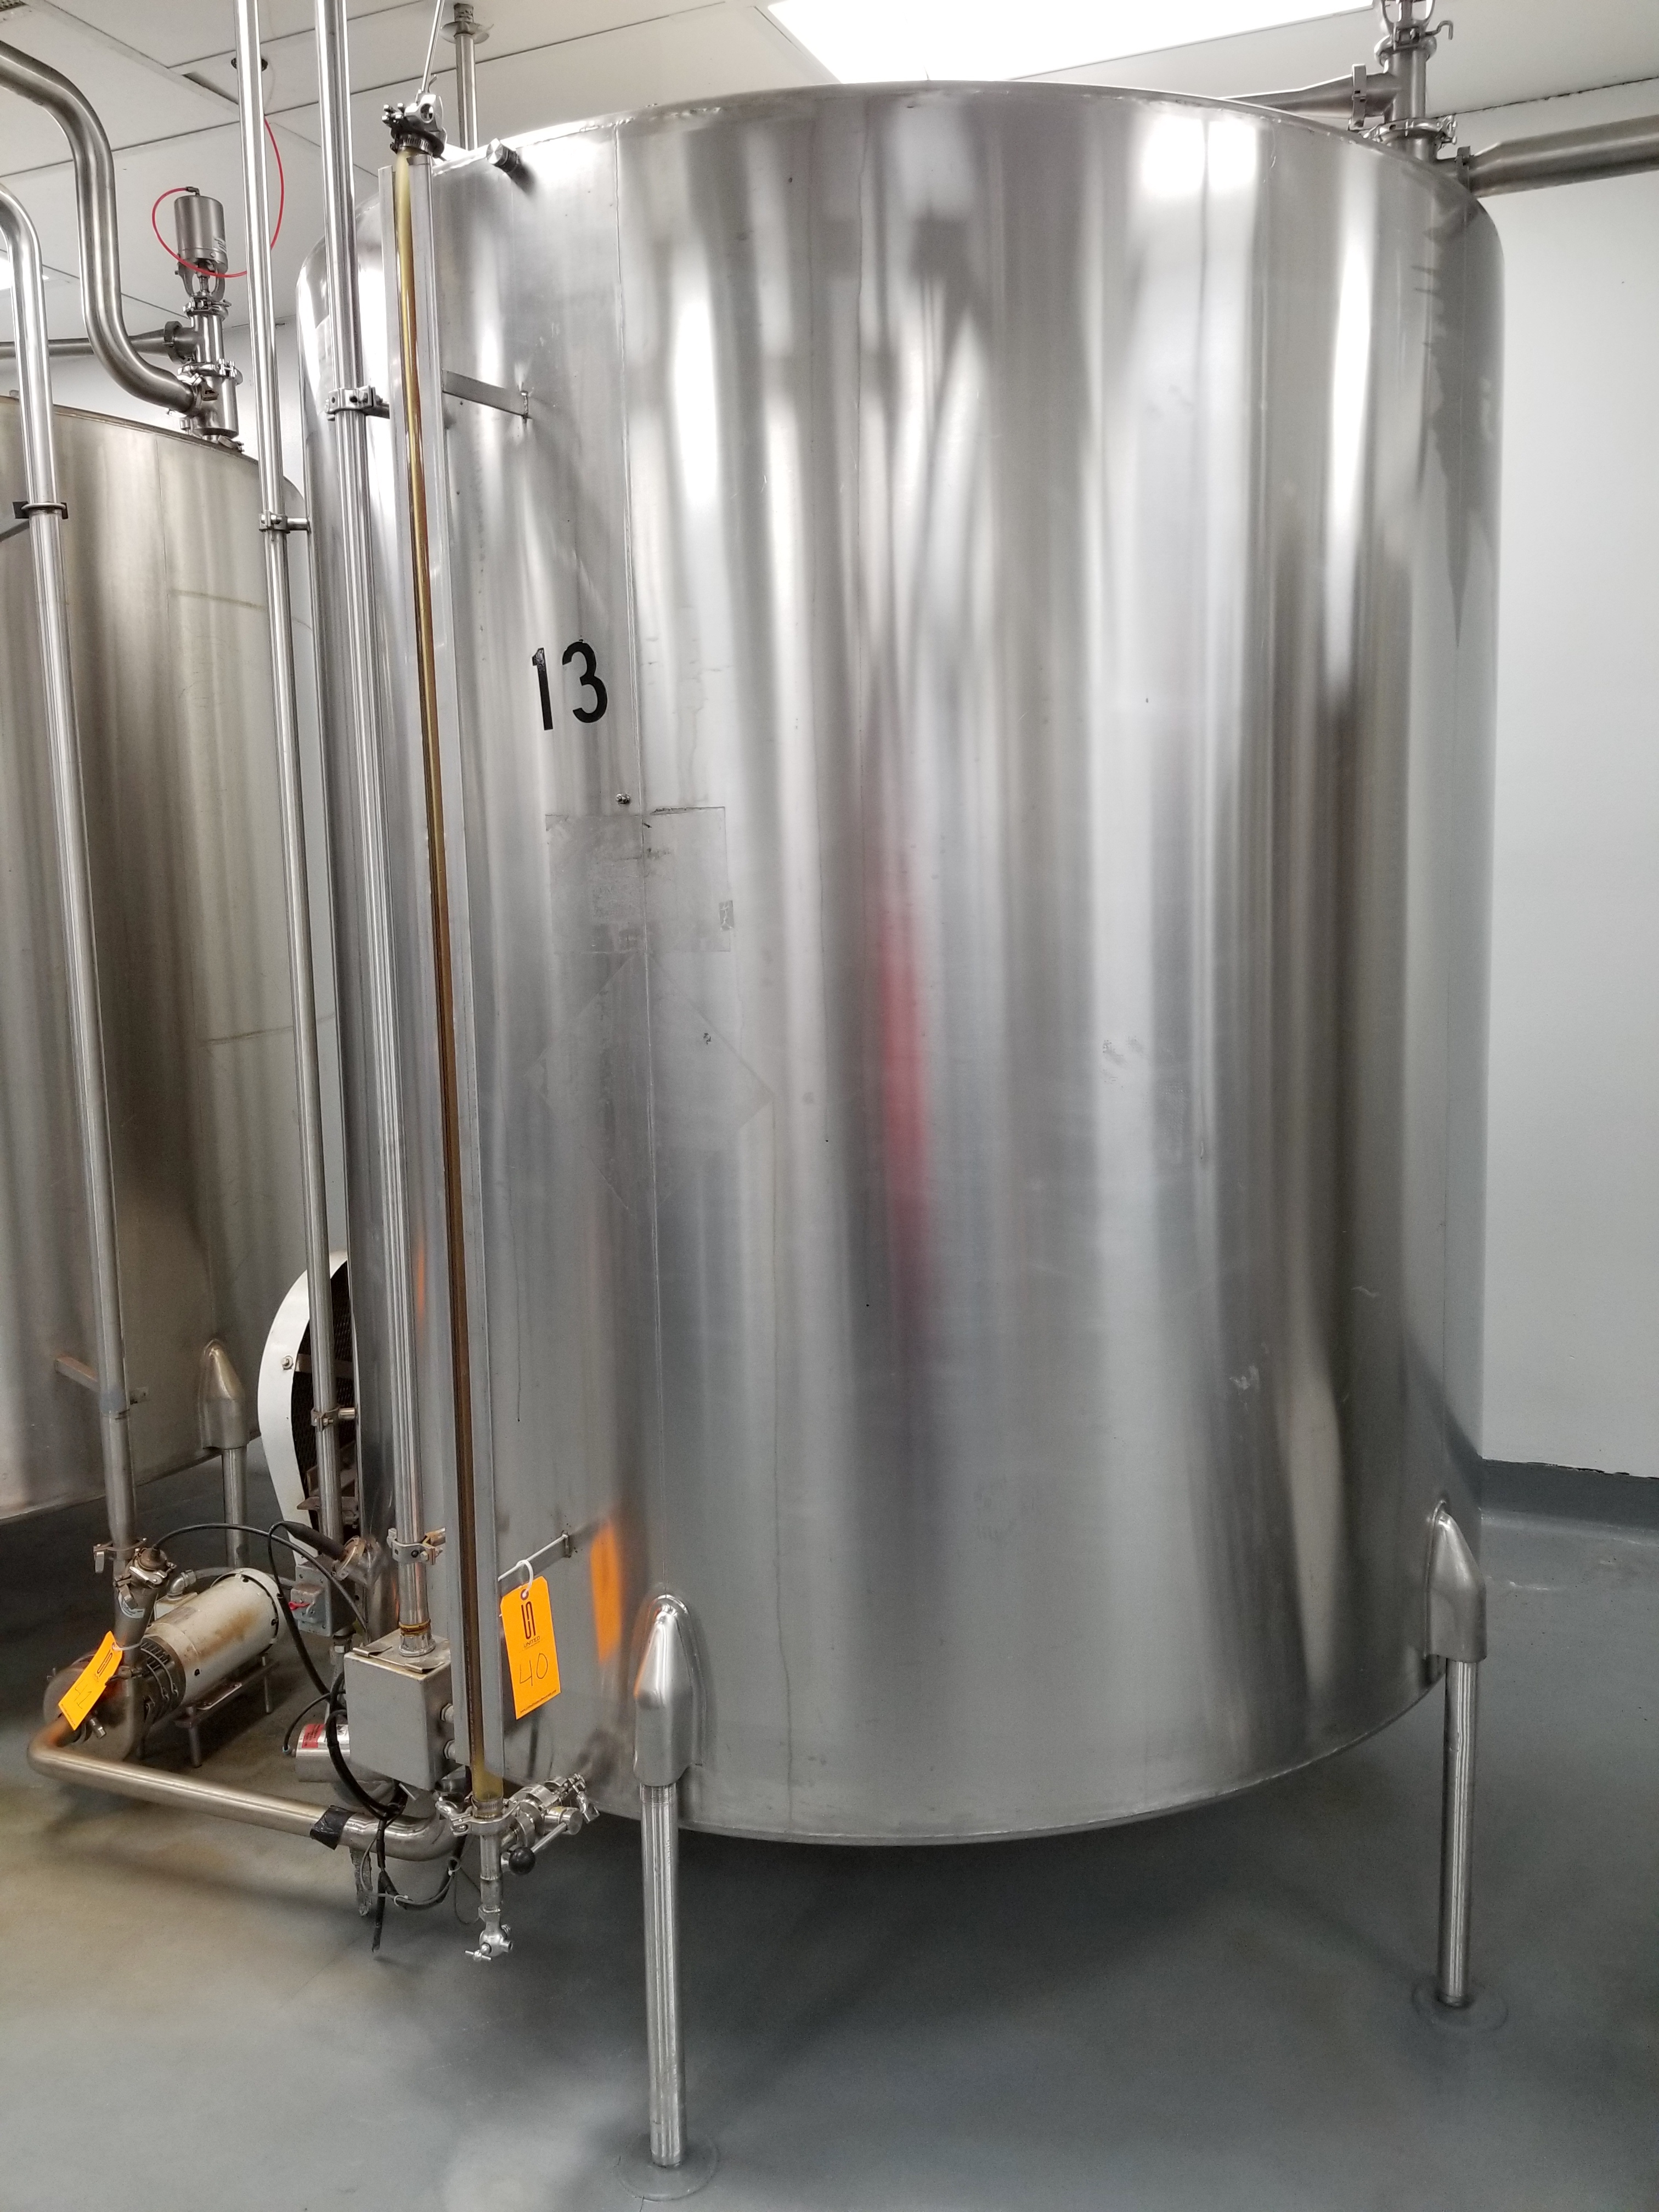 Chem Tank 2,000 Gallon Vertical Mixing Tank